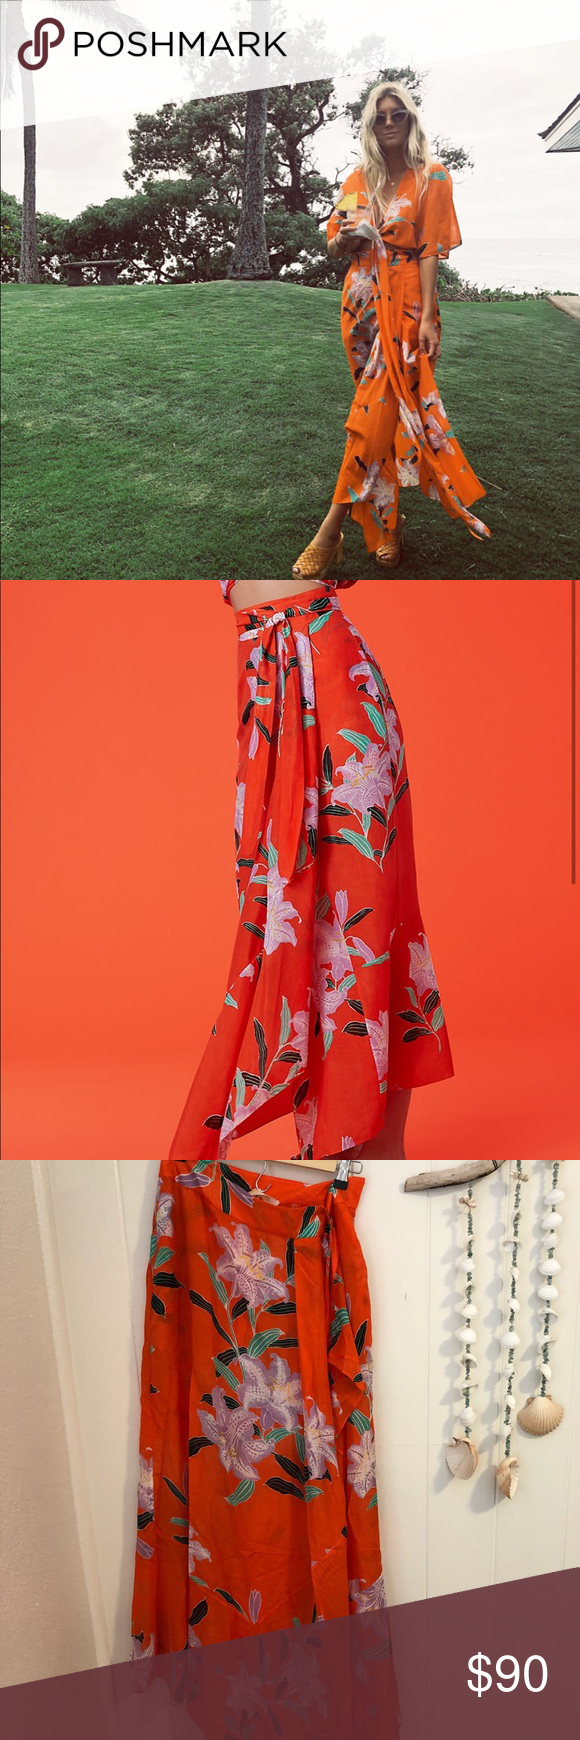 44568423f69f4 Diane Von Furstenberg Draped Wrap Beach Skirt Worn once. For more info  please google style name ✌🏼 Diane Von Furstenberg Skirts